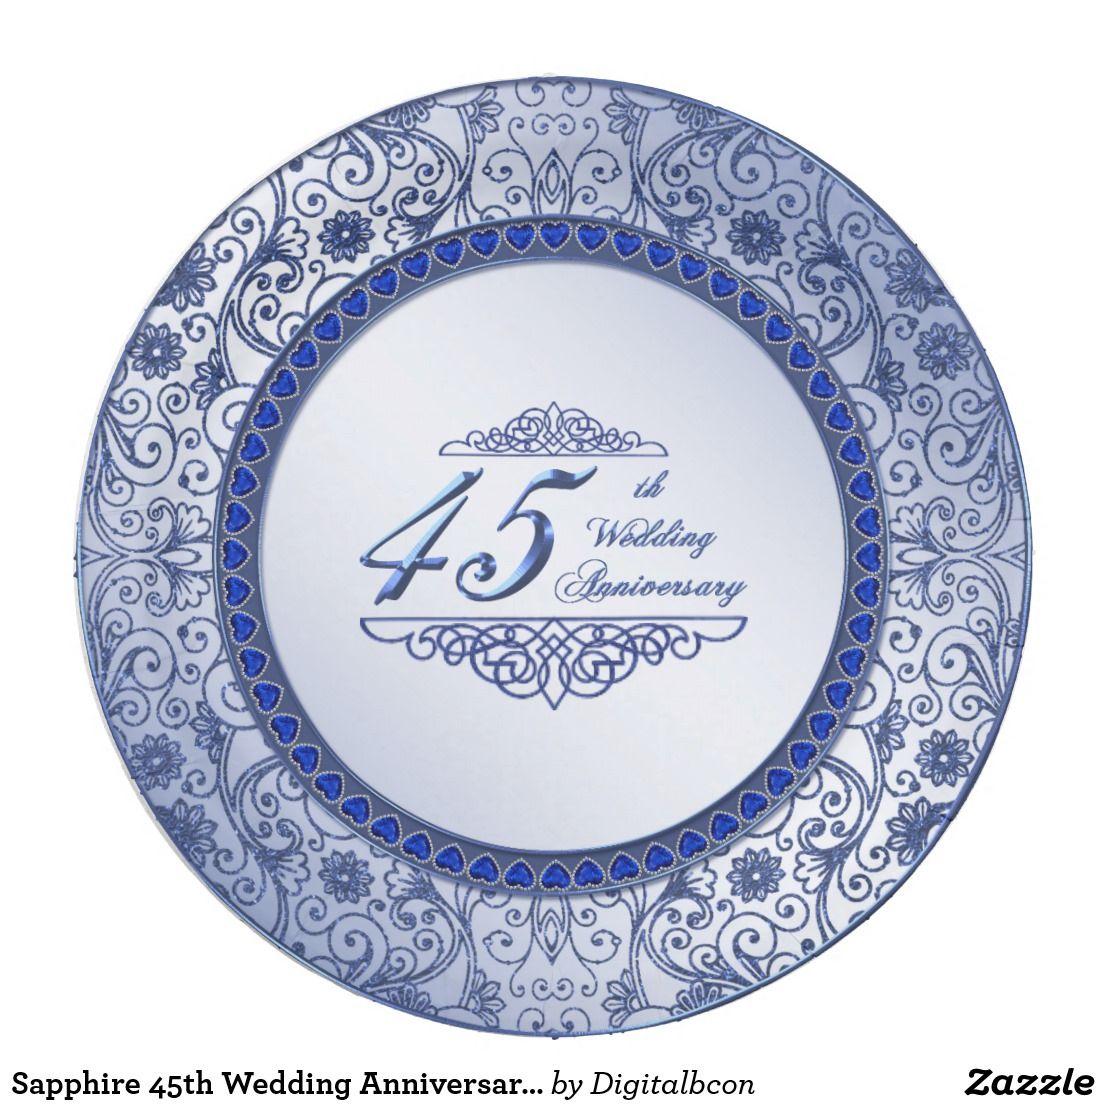 Sapphire 45th Wedding Anniversary Paper Plate 45th